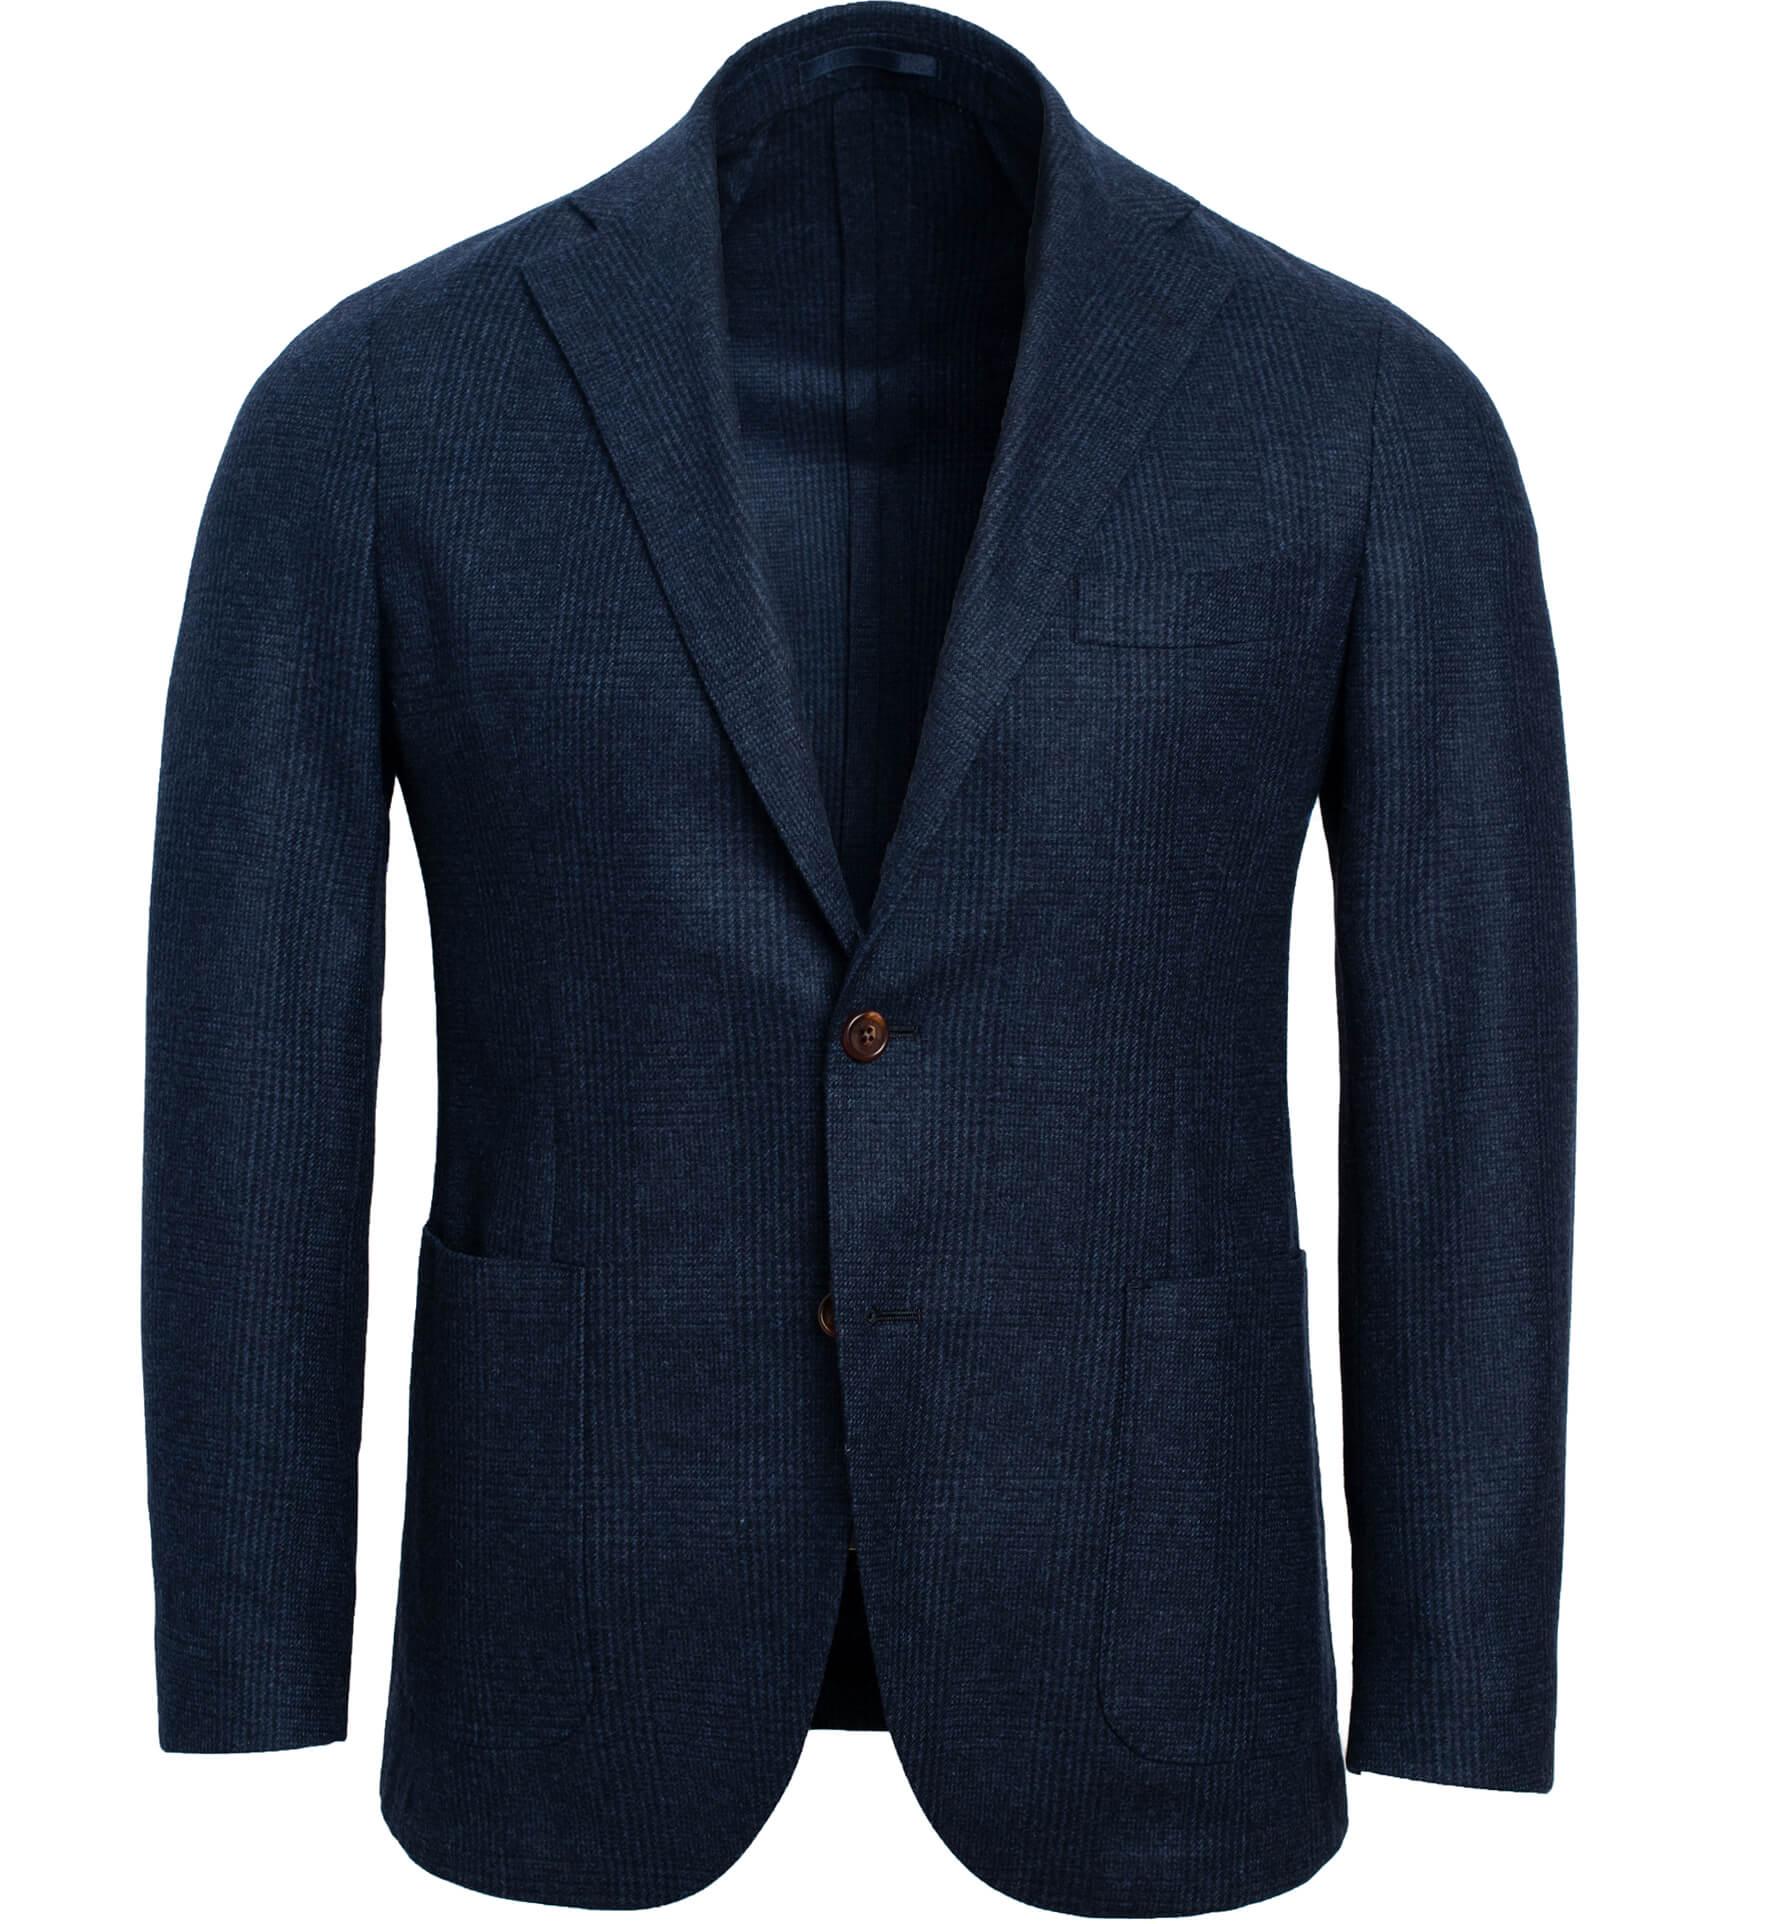 Zoom Image of Waverly Navy Glen Plaid Wool and Cashmere Jacket